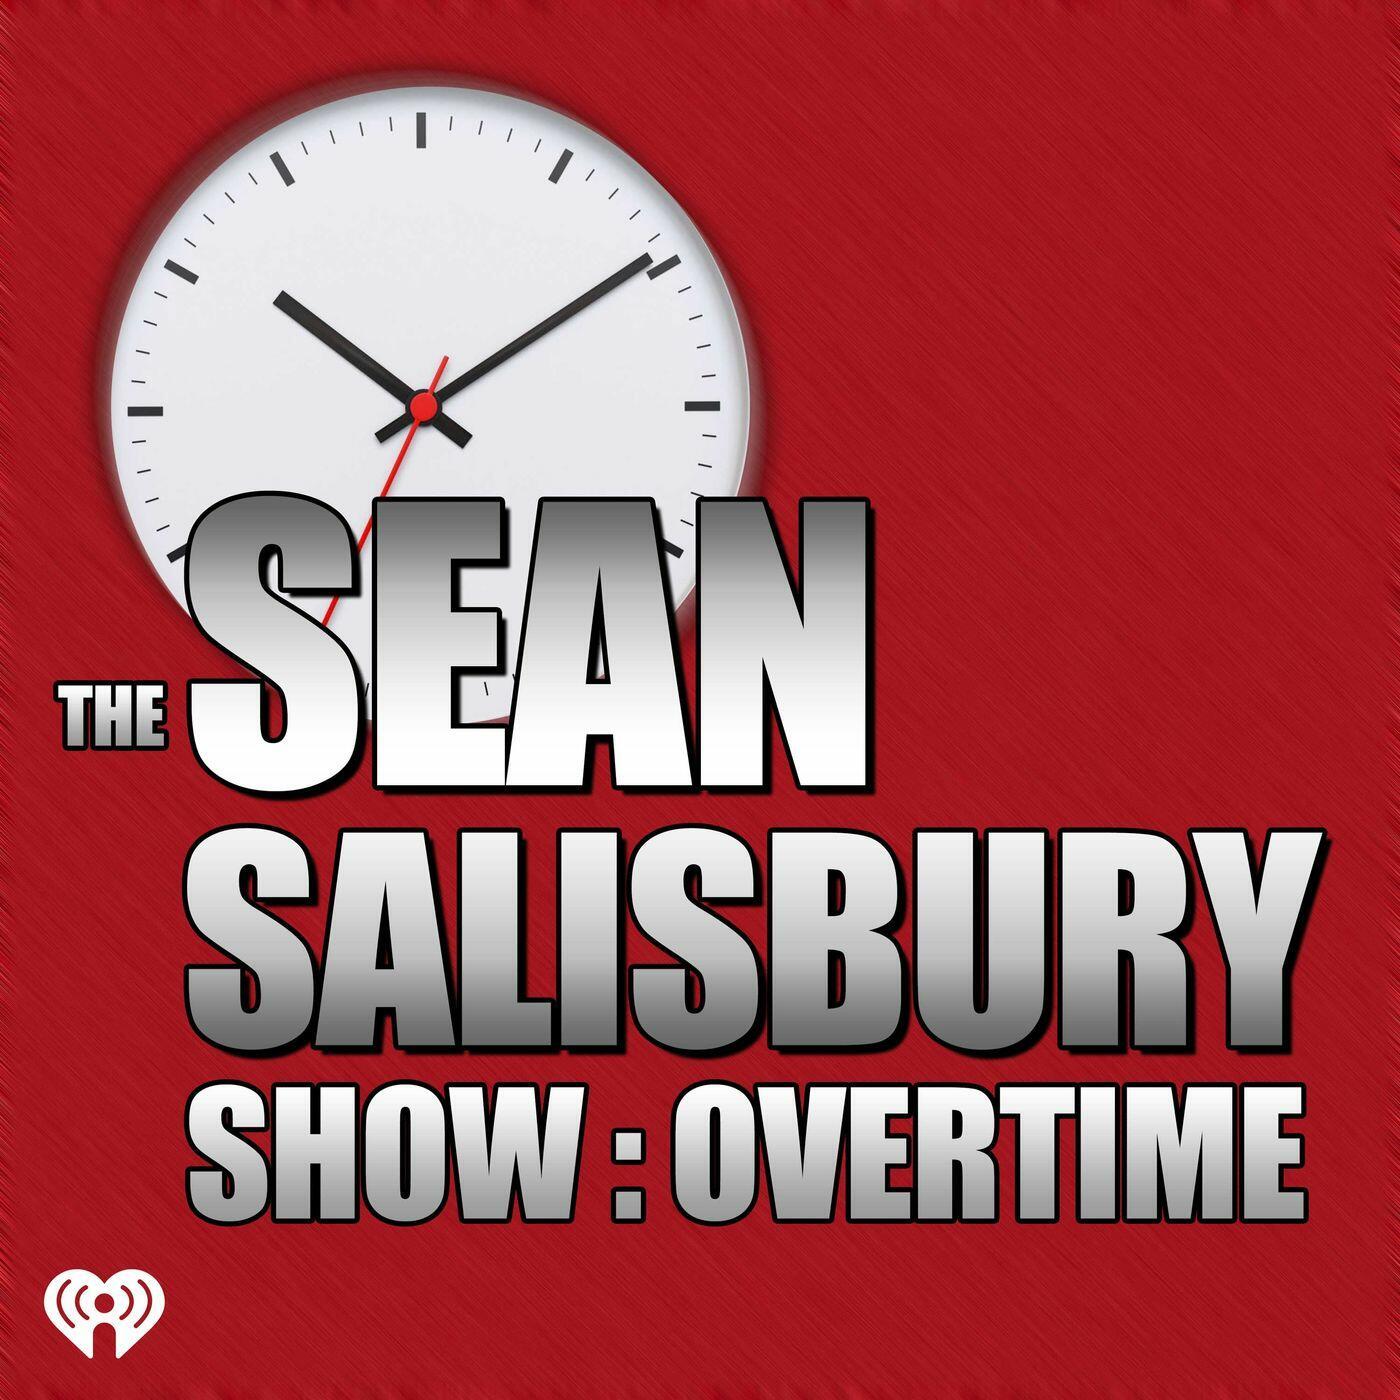 The Sean Salisbury Show: Overtime